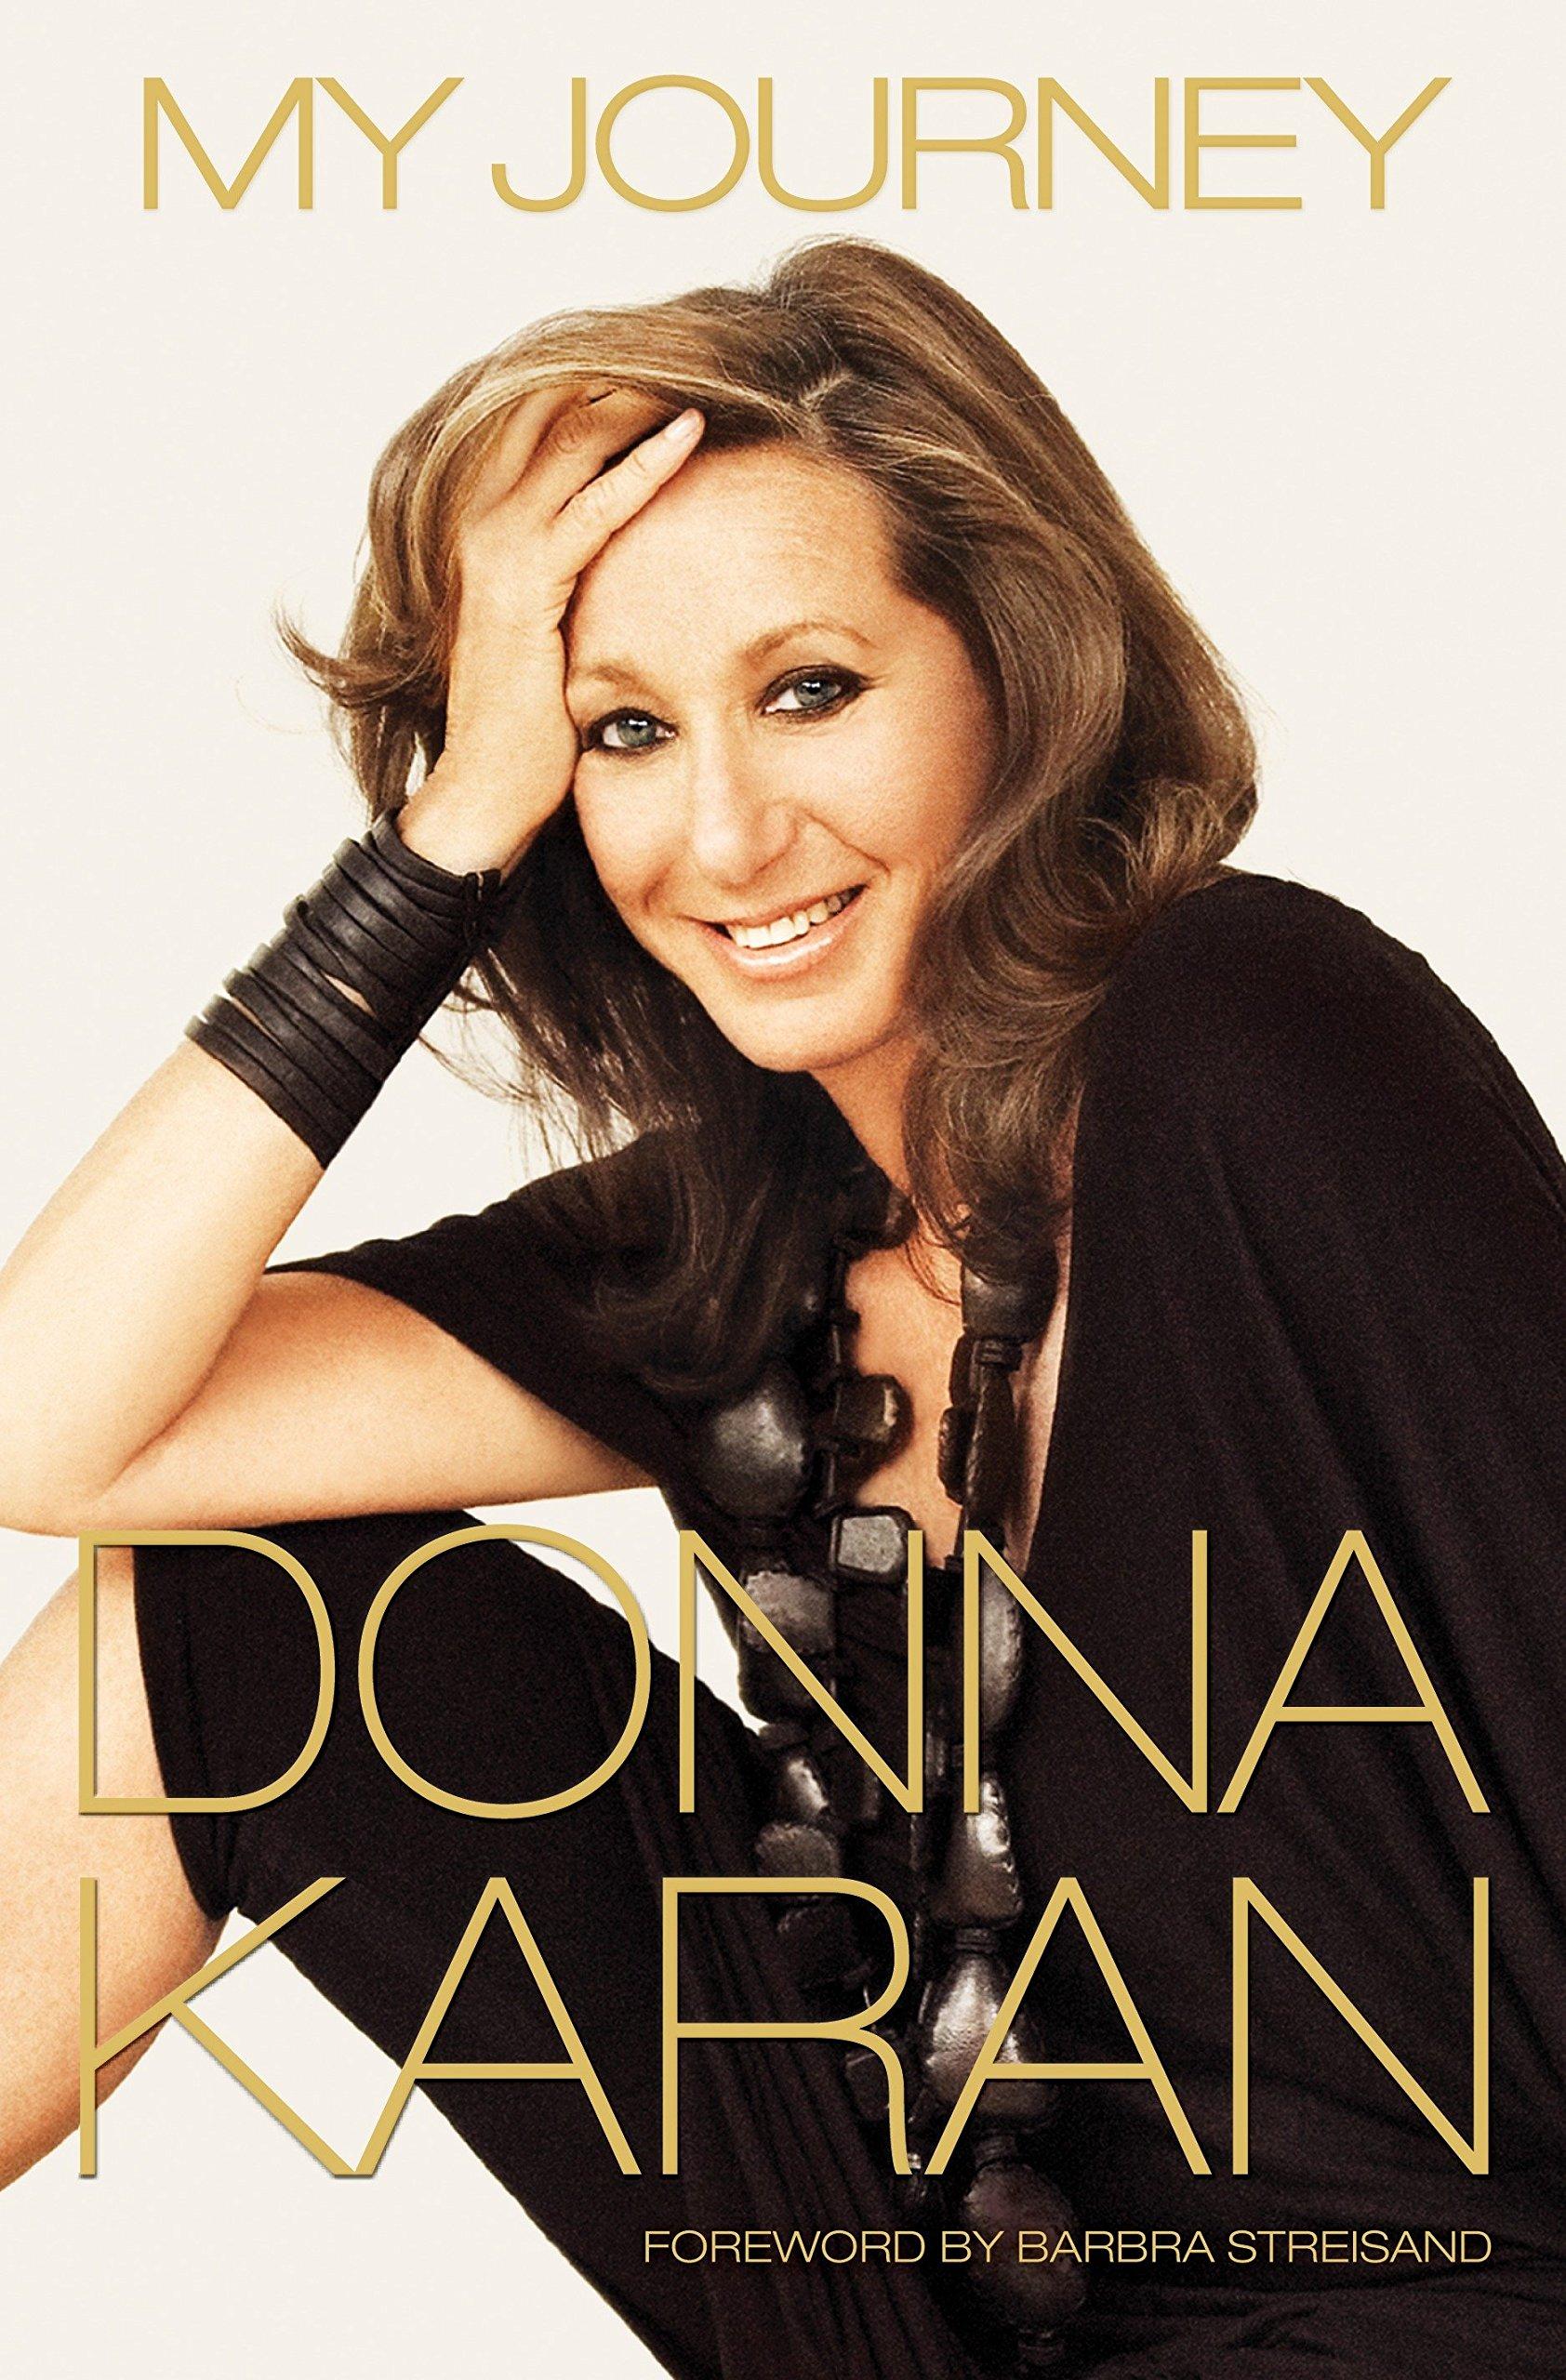 My Journey Karan Donna 9781101883495 Amazon Com Books